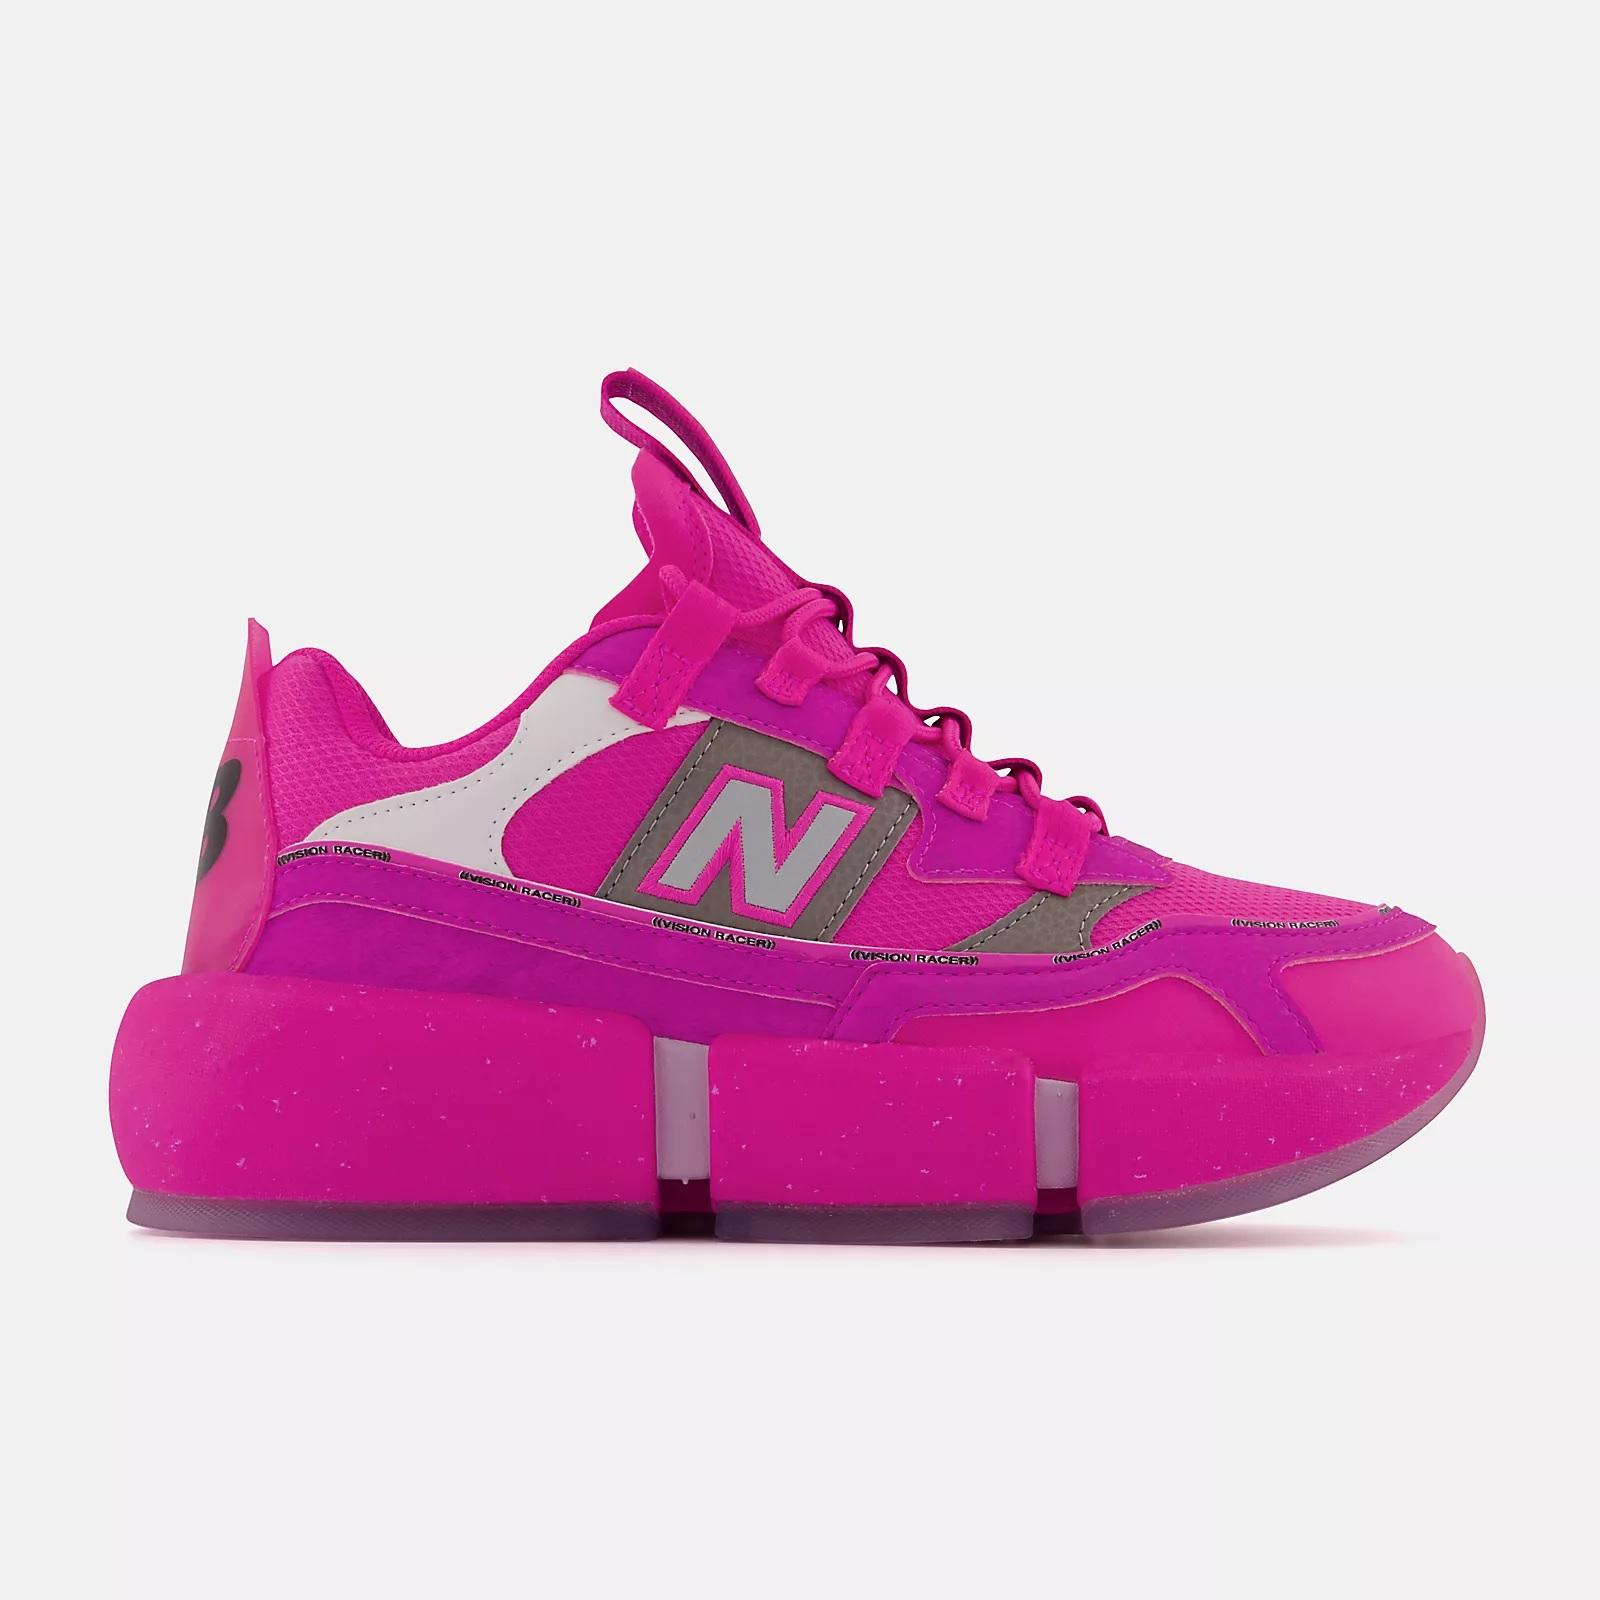 Jaden Smith x New Balance Vision Racer 'Pink'